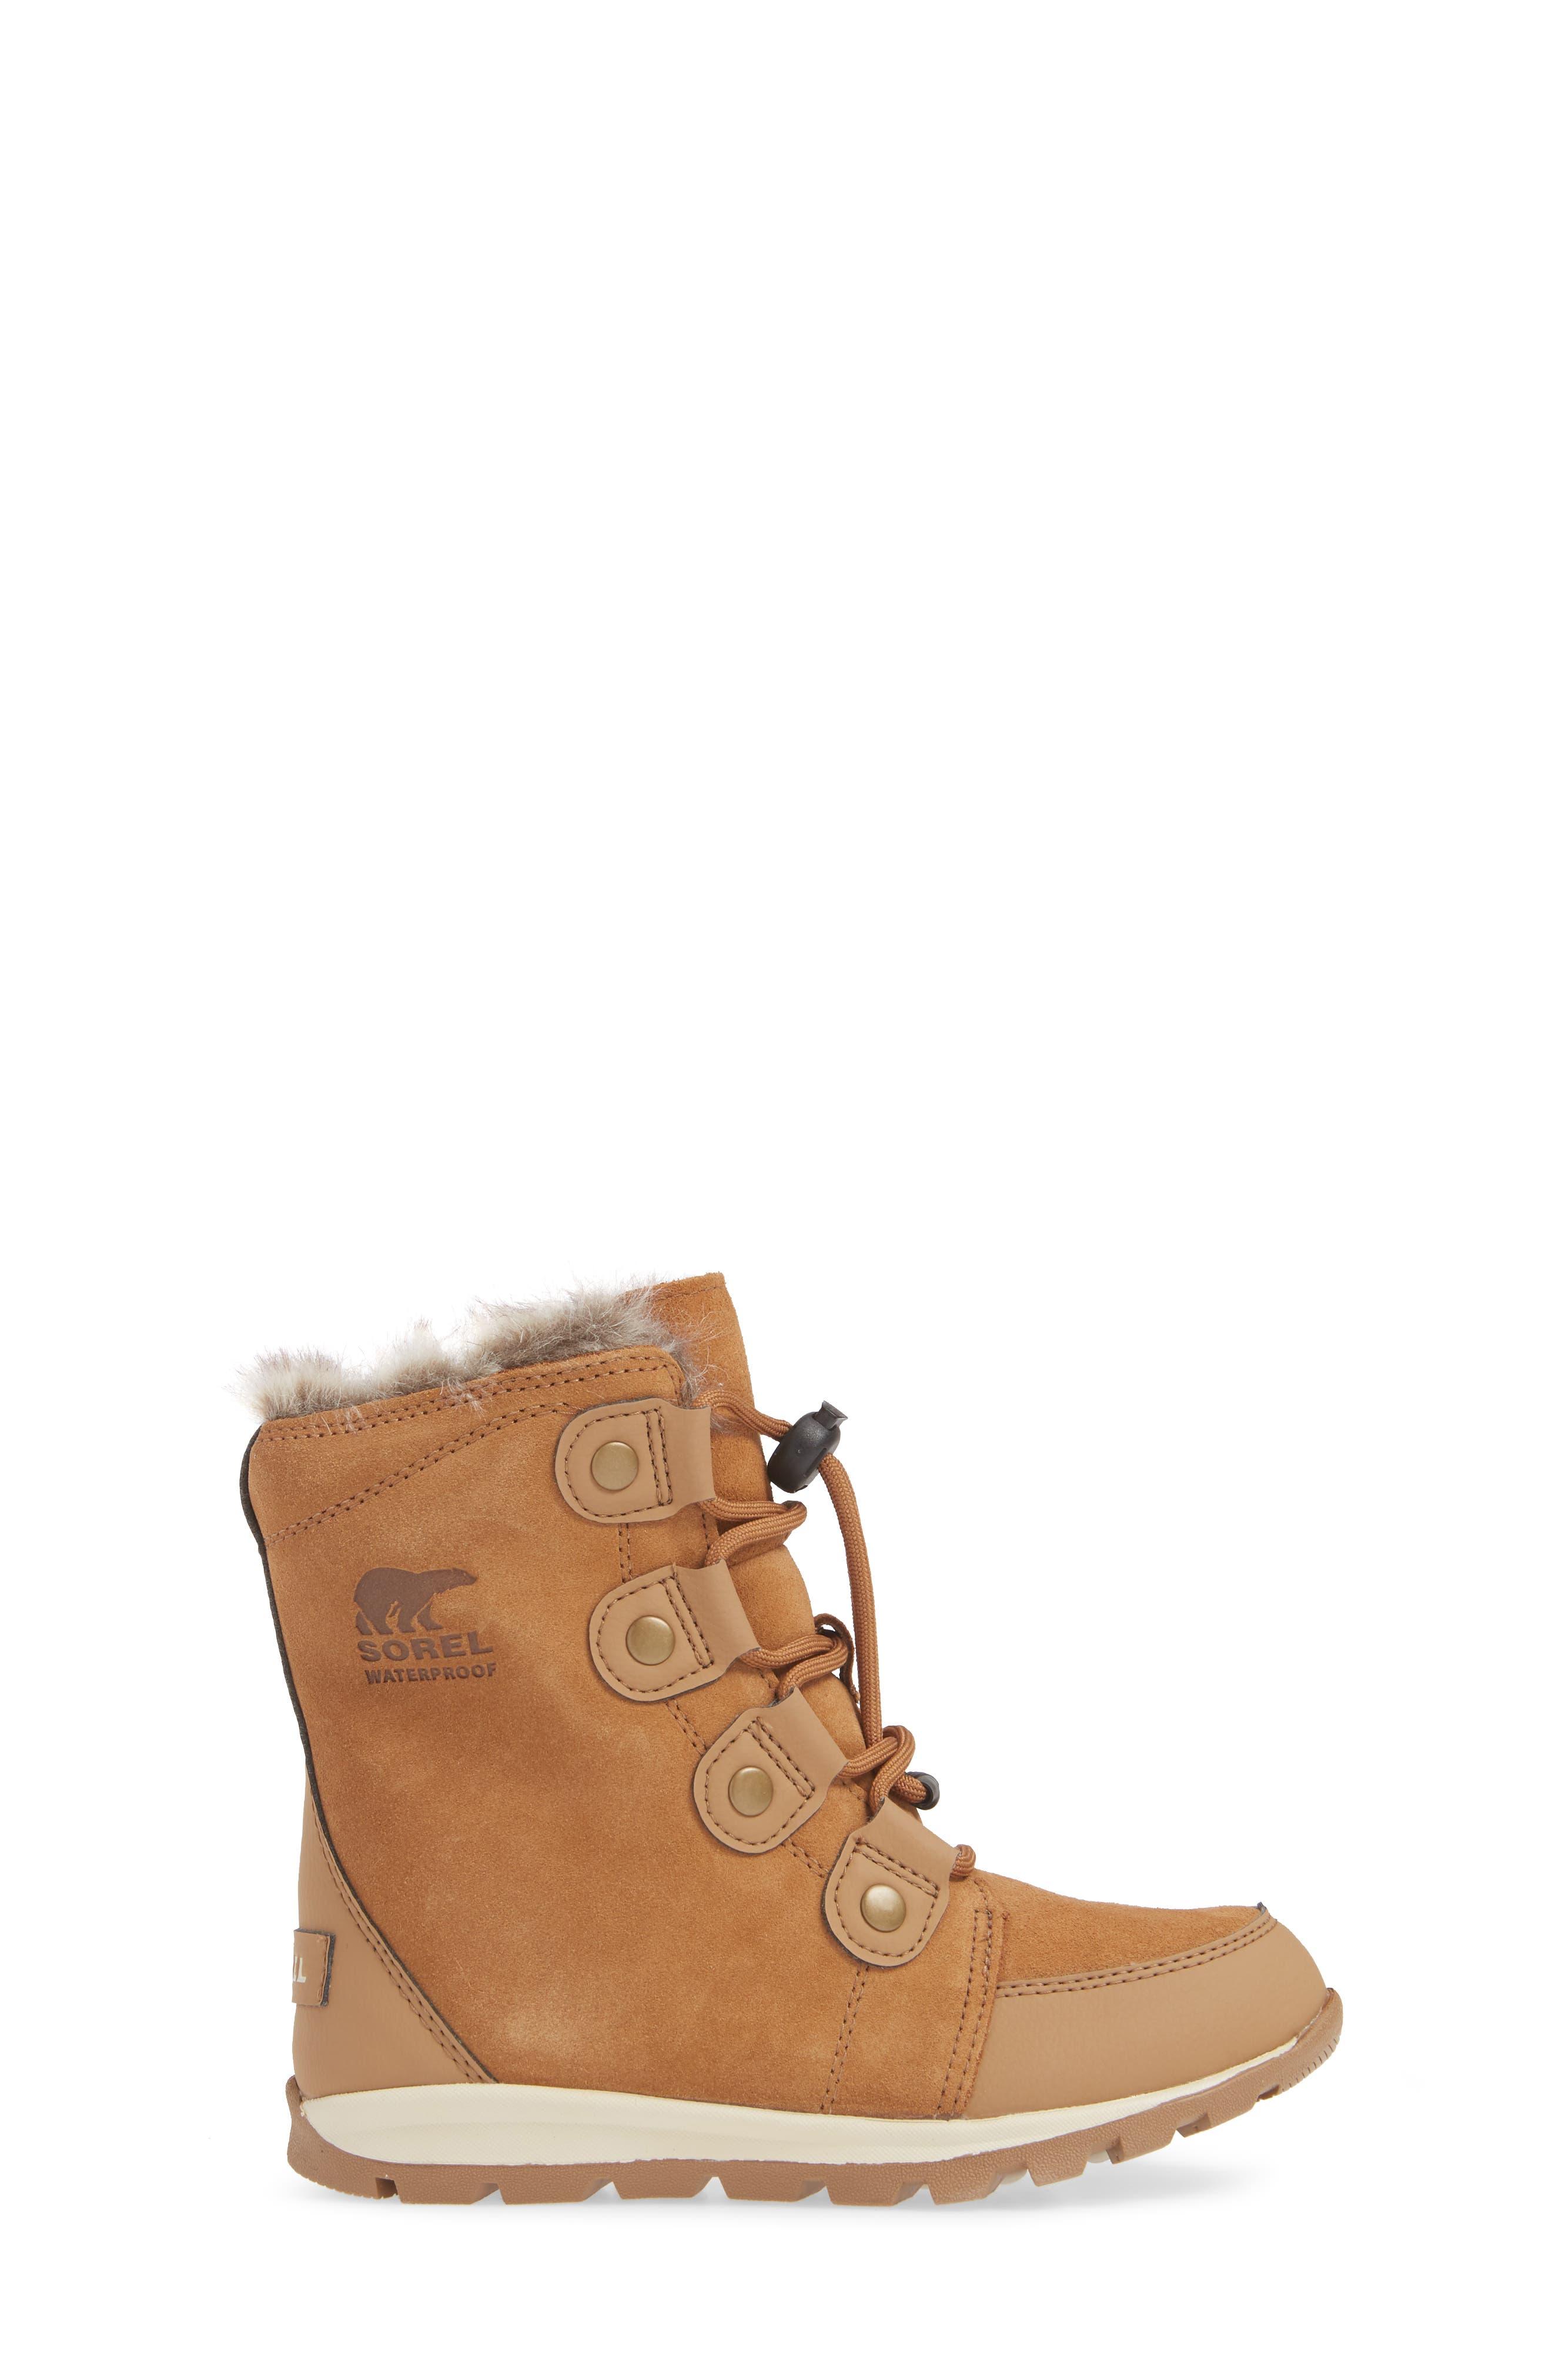 Whitney Suede Waterproof Faux Fur Boot,                             Alternate thumbnail 3, color,                             ELK/ NATURAL